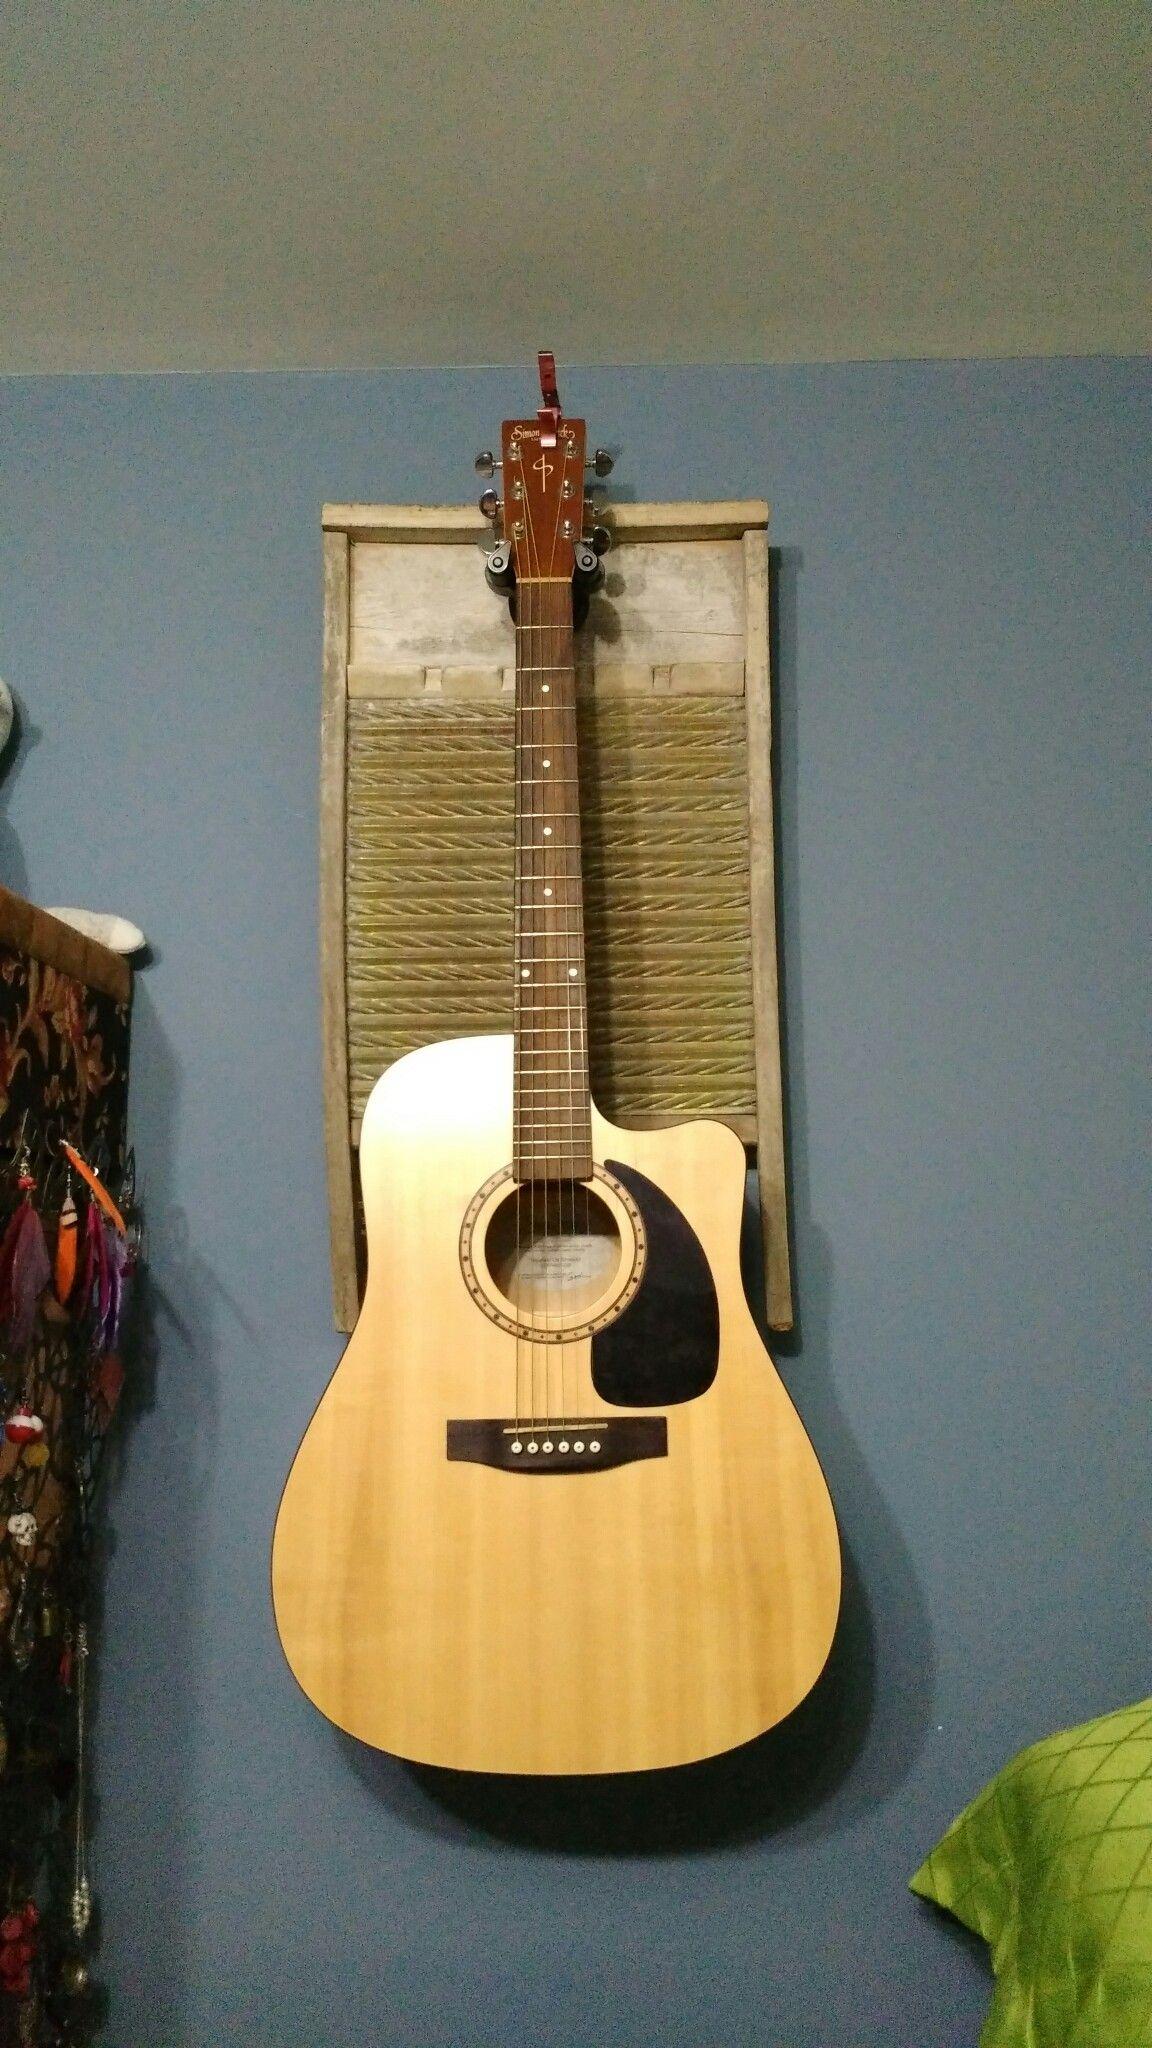 Diy old washboard turned into guitar wall hanger guitar